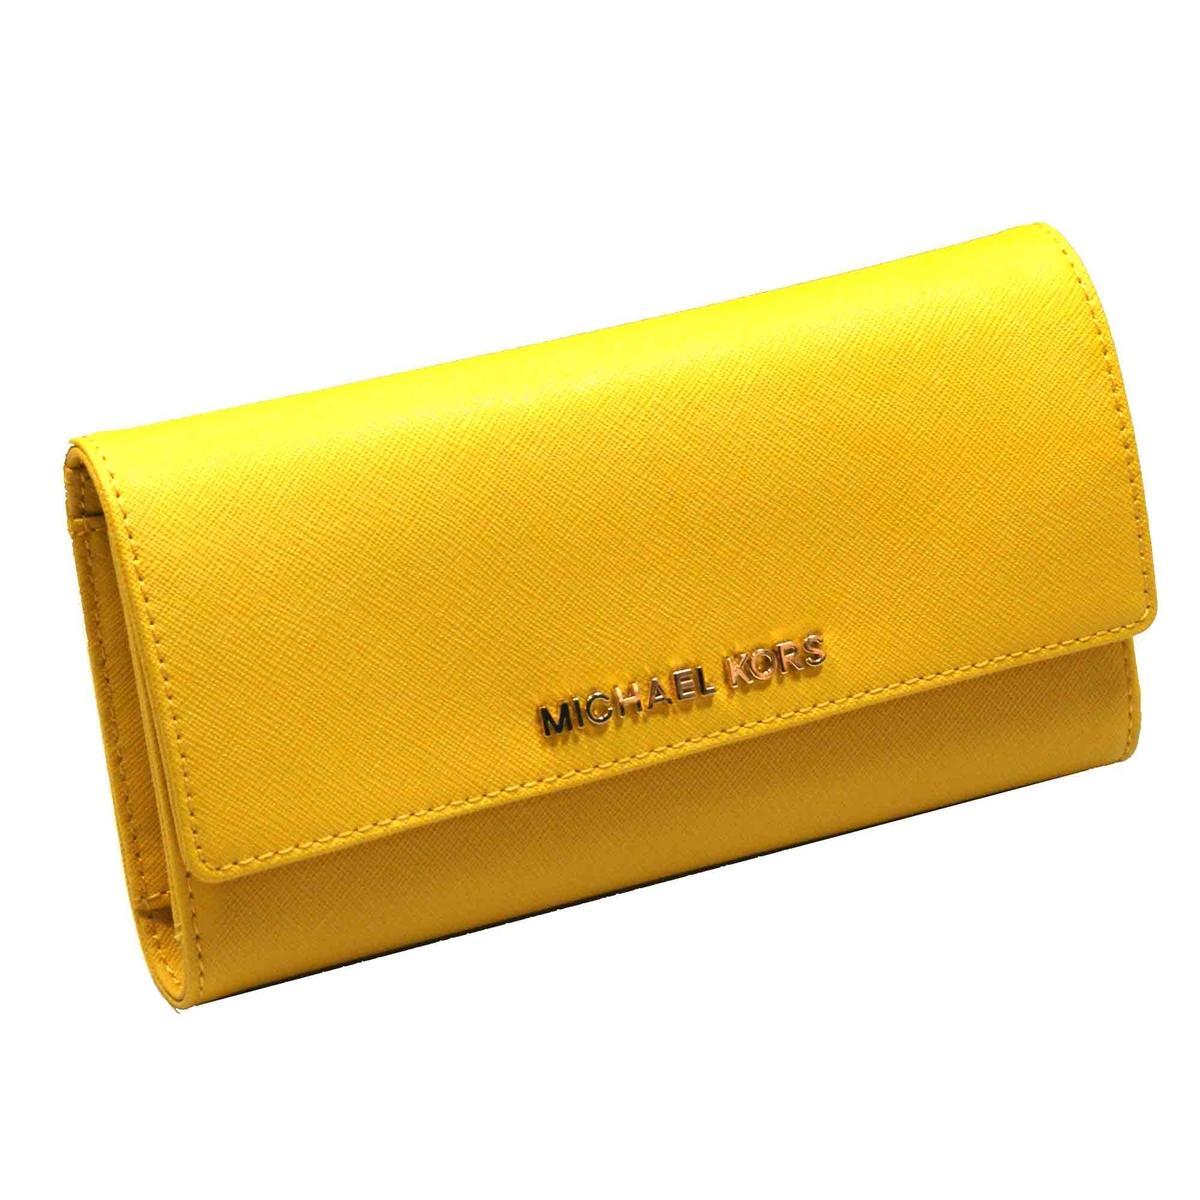 michael kors jet set travel leather checkbook wallet clutch sun 32t4gtve4l michael kors. Black Bedroom Furniture Sets. Home Design Ideas